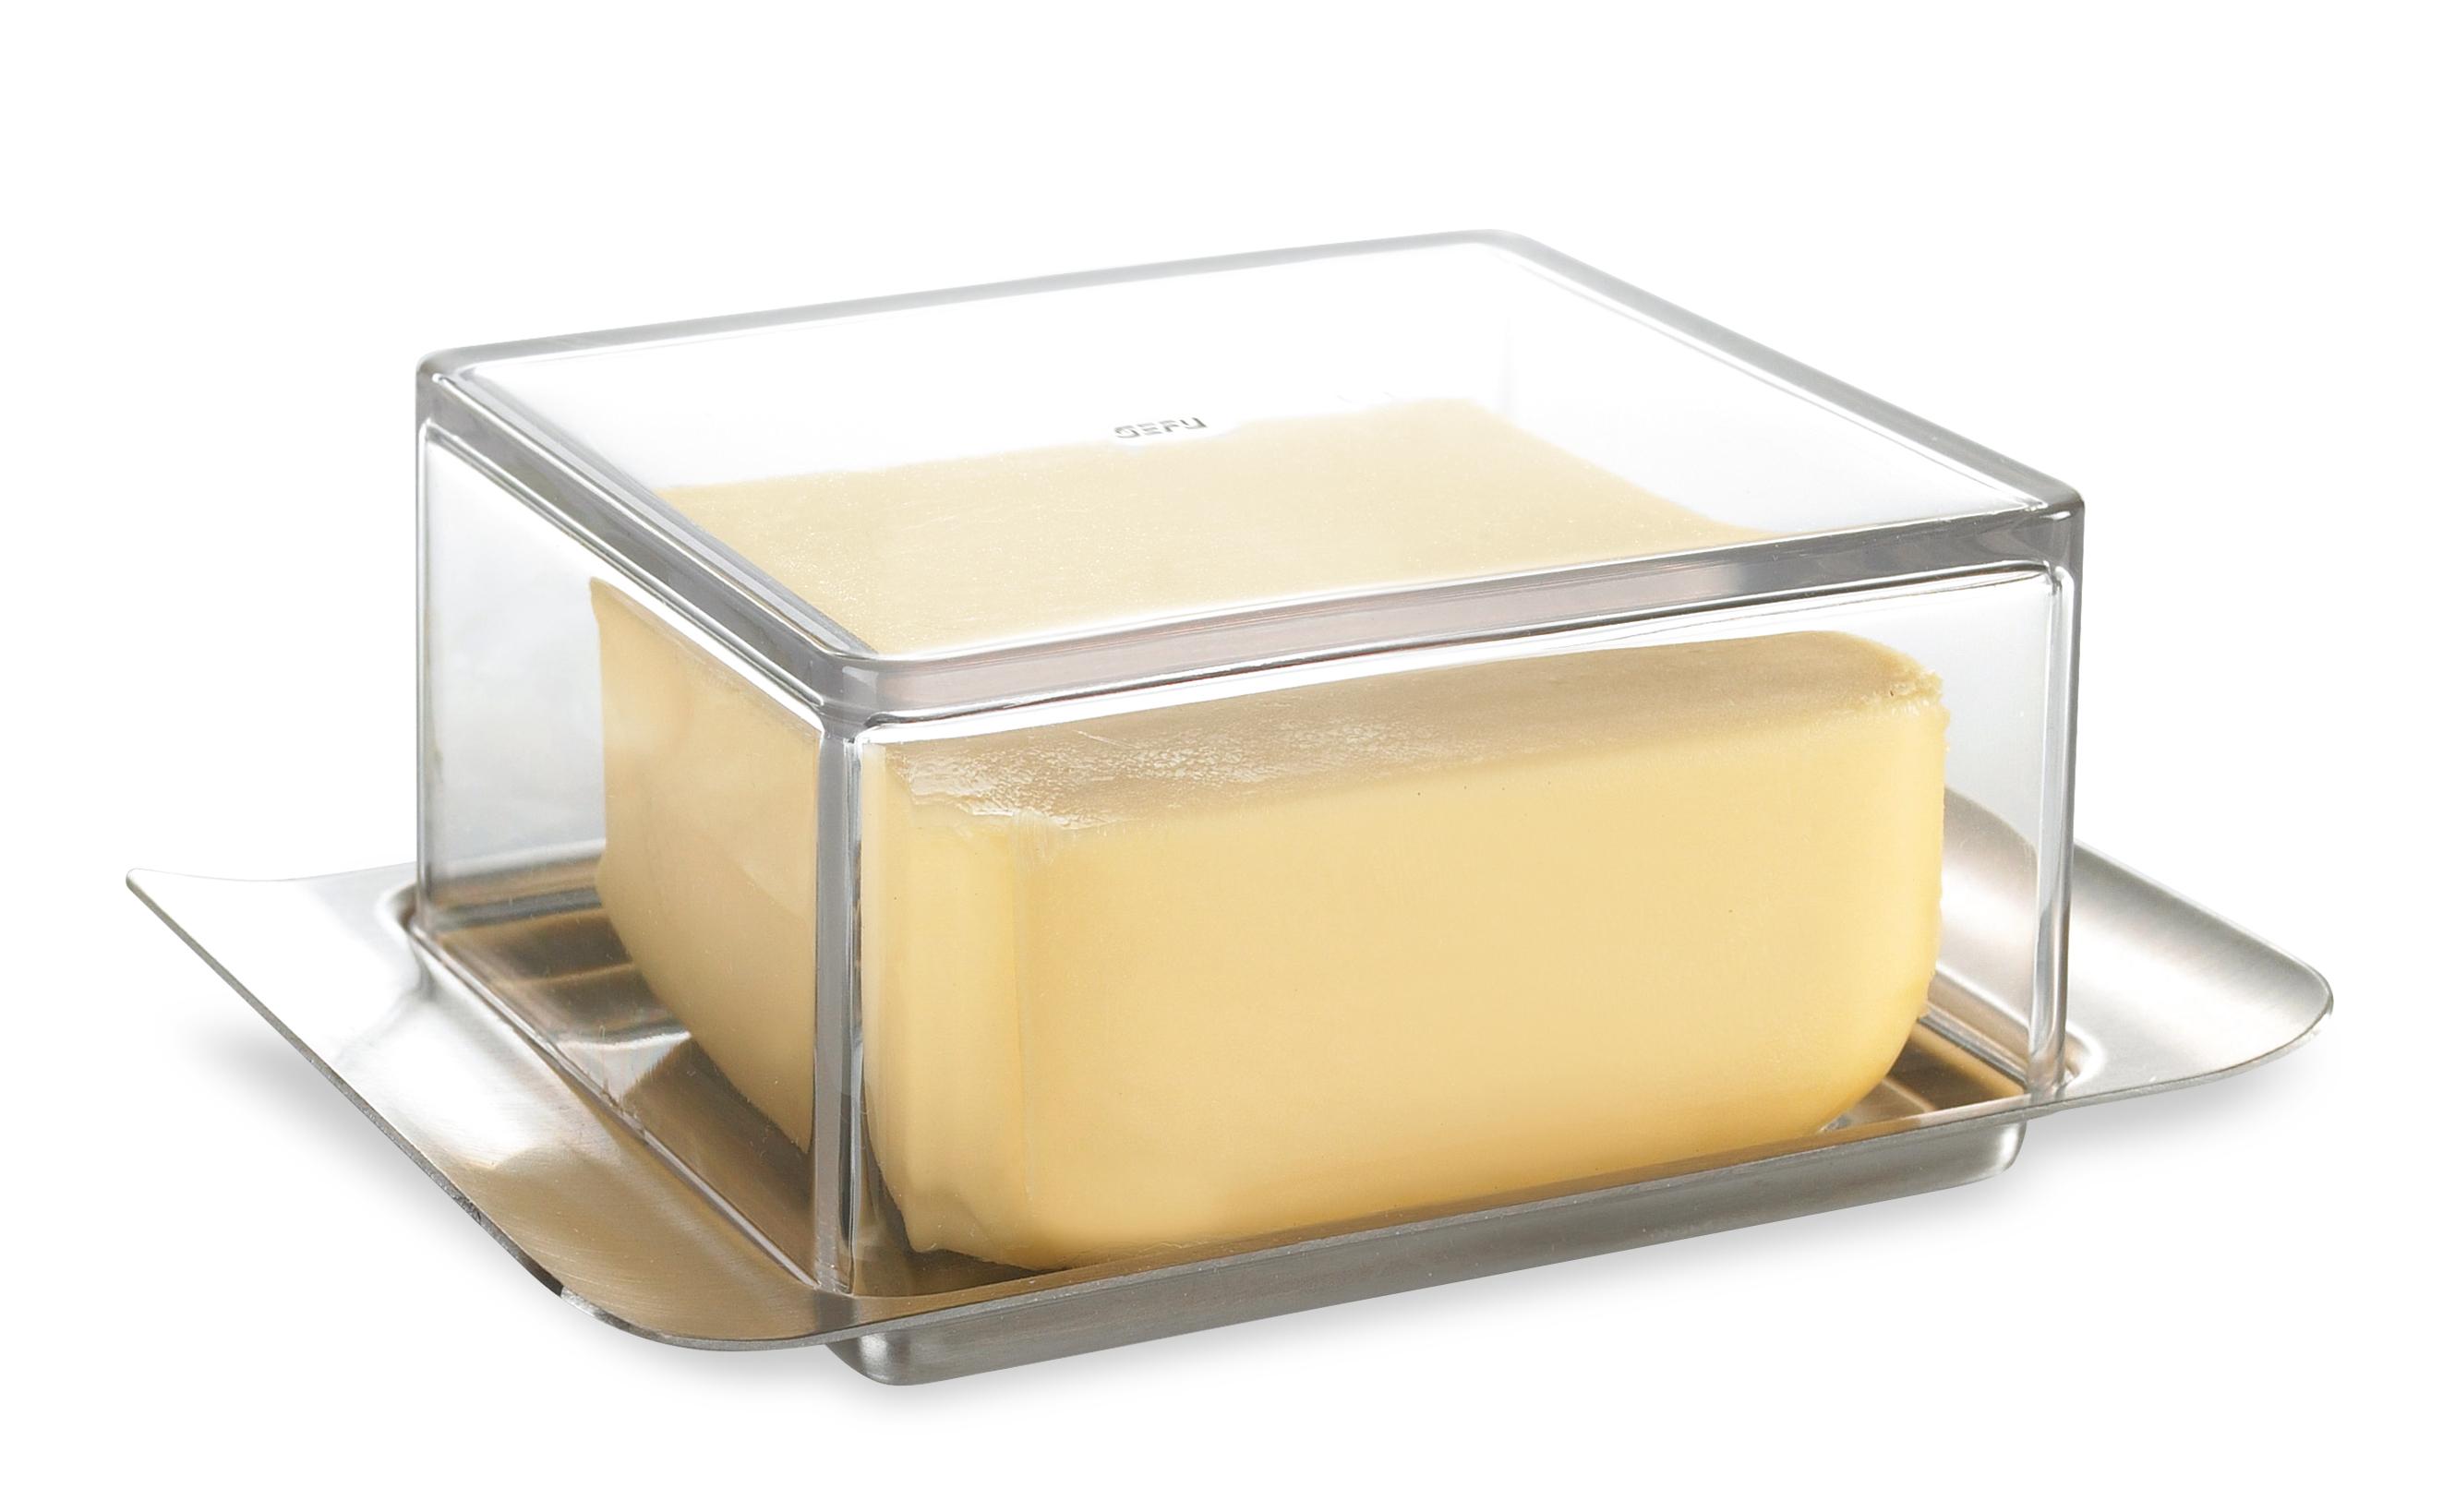 BRUNCH Butterdose